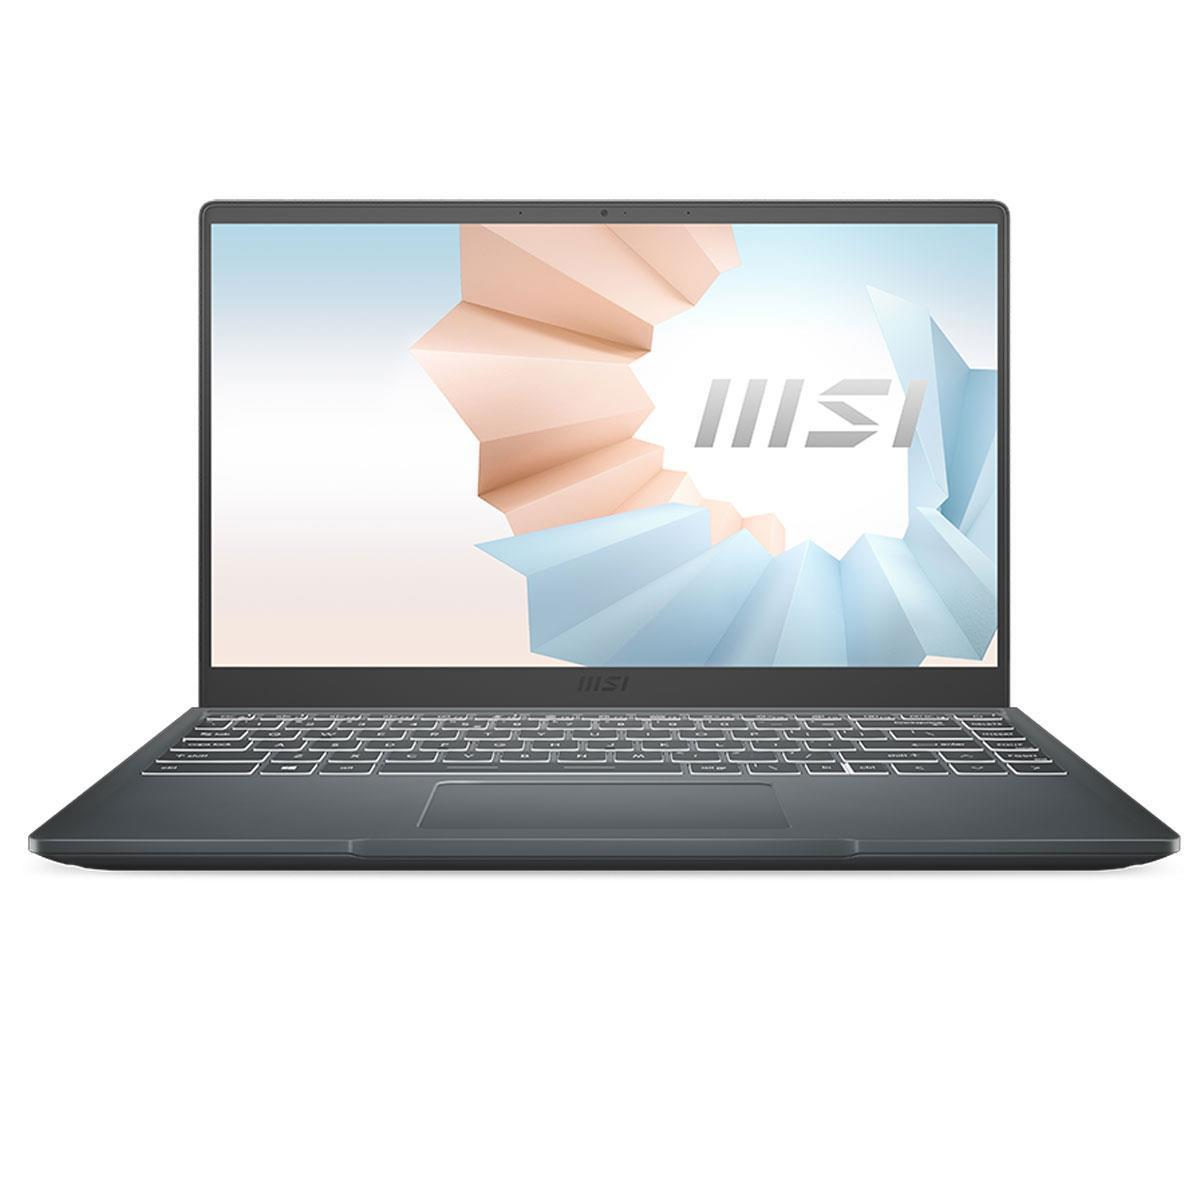 "MSI Modern 14 B11SB-288 14"" Full HD Notebook Computer (MODERN 14 B11SB-288)"